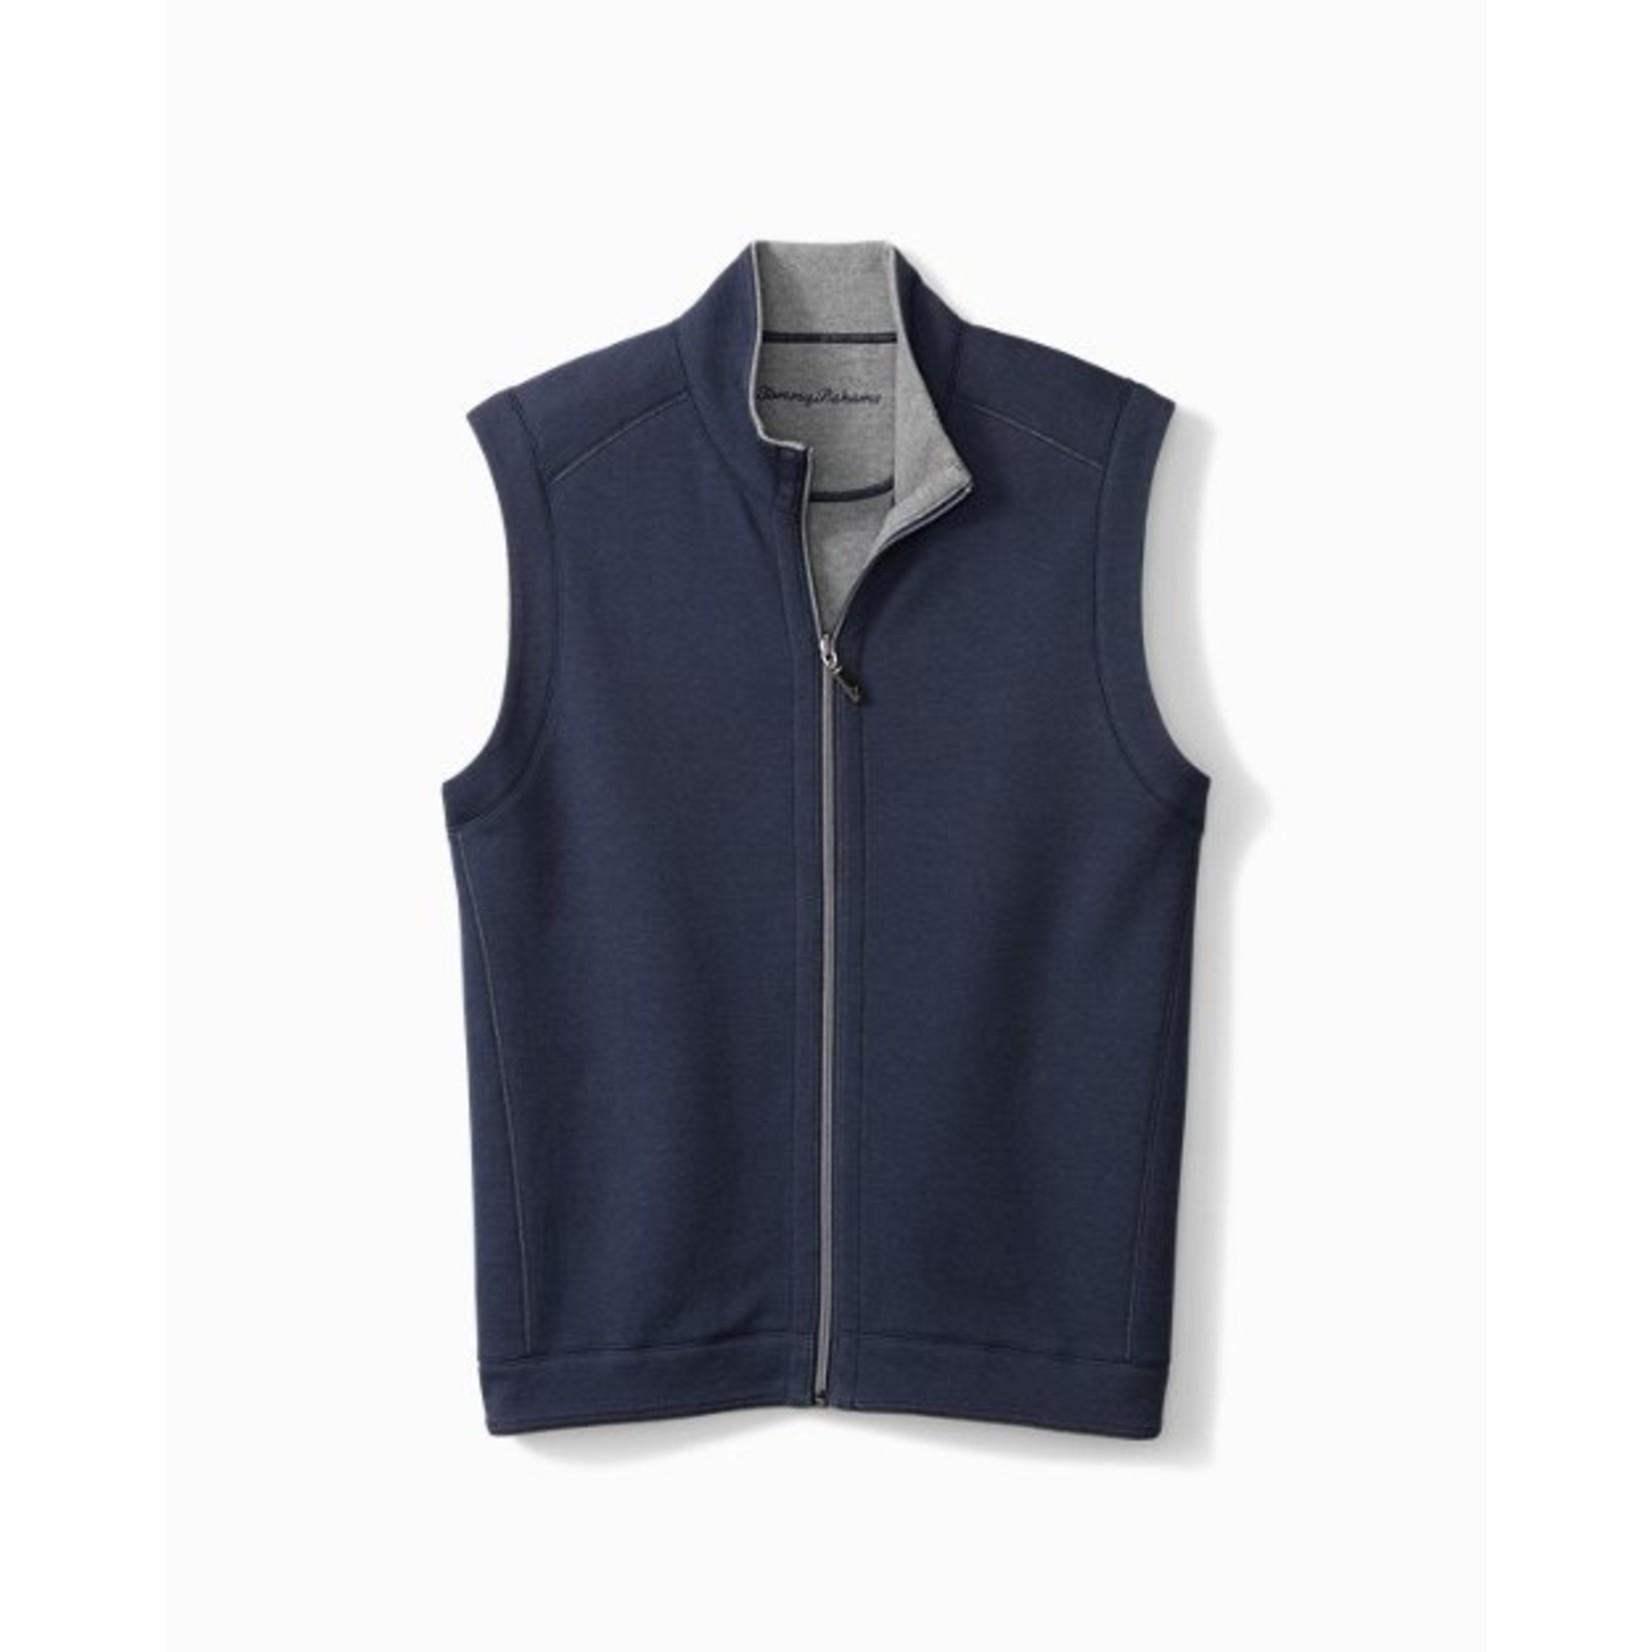 Tommy Bahama Tommy Bahama ST225594 Flipshore Full Zip Vest - 18792 Rockshade Heather